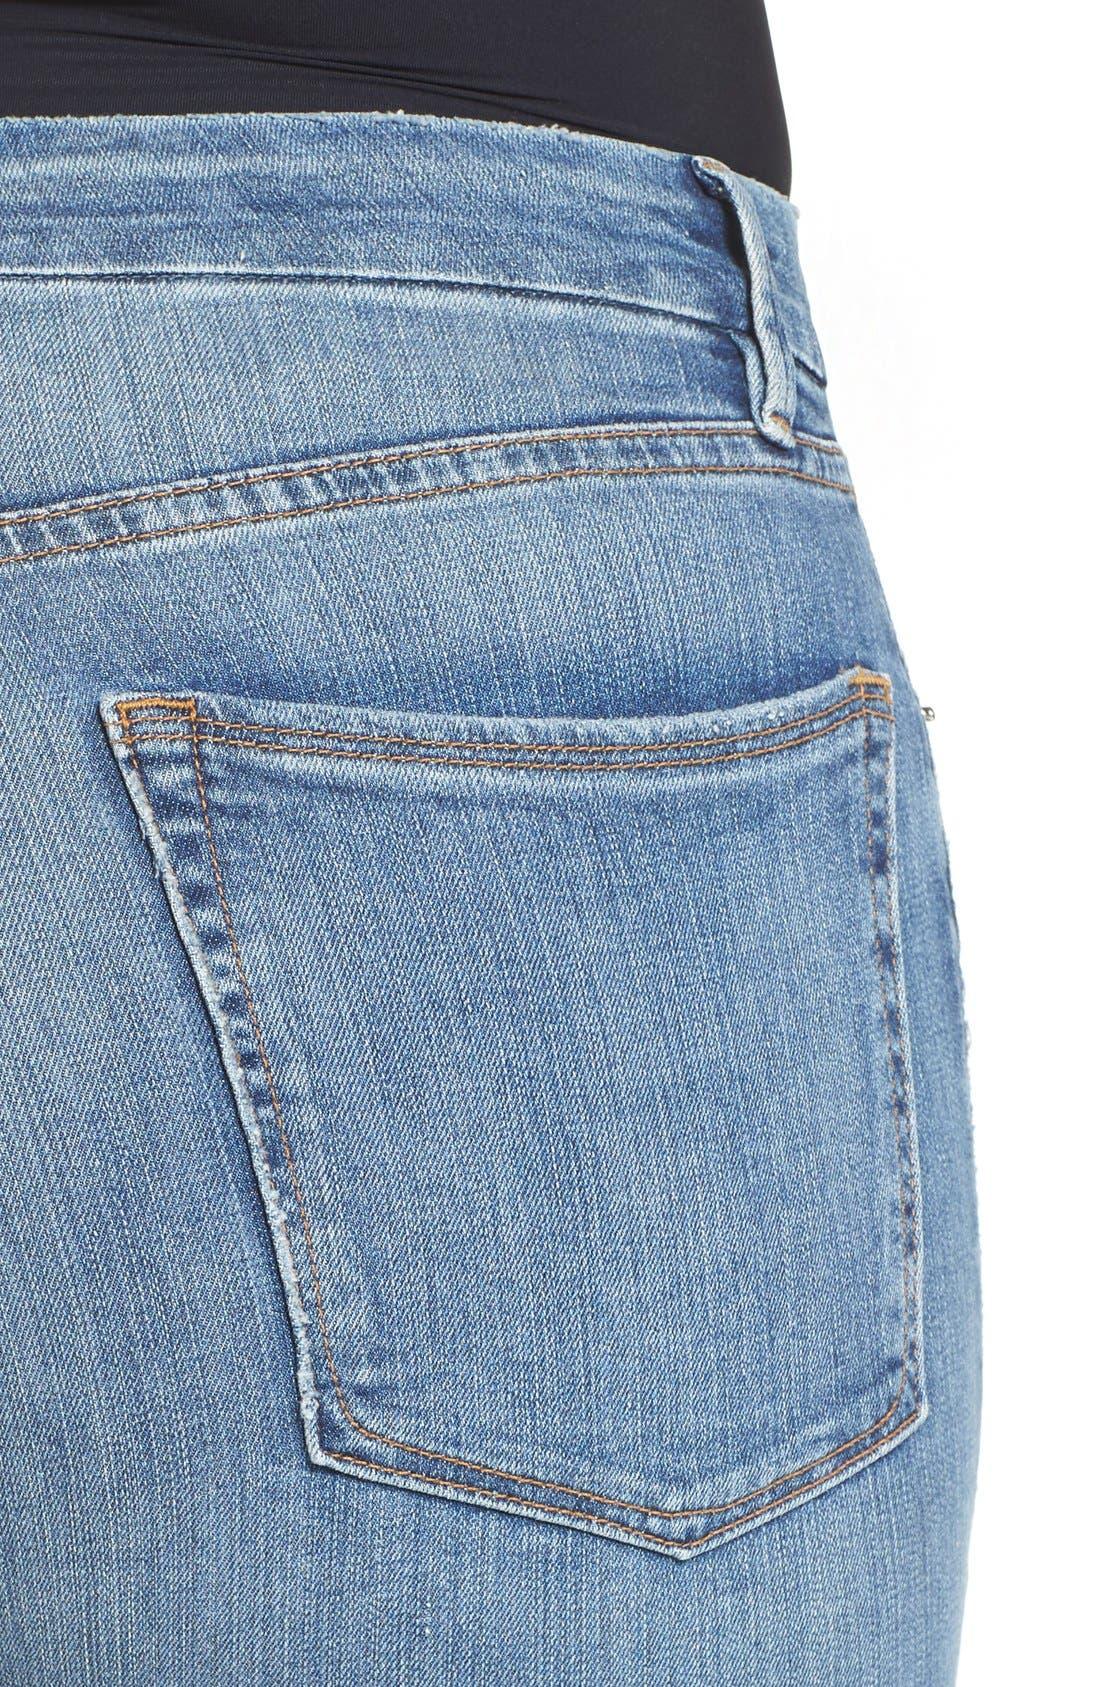 Alternate Image 6  - Good American Good Cuts High Rise Boyfriend Jeans